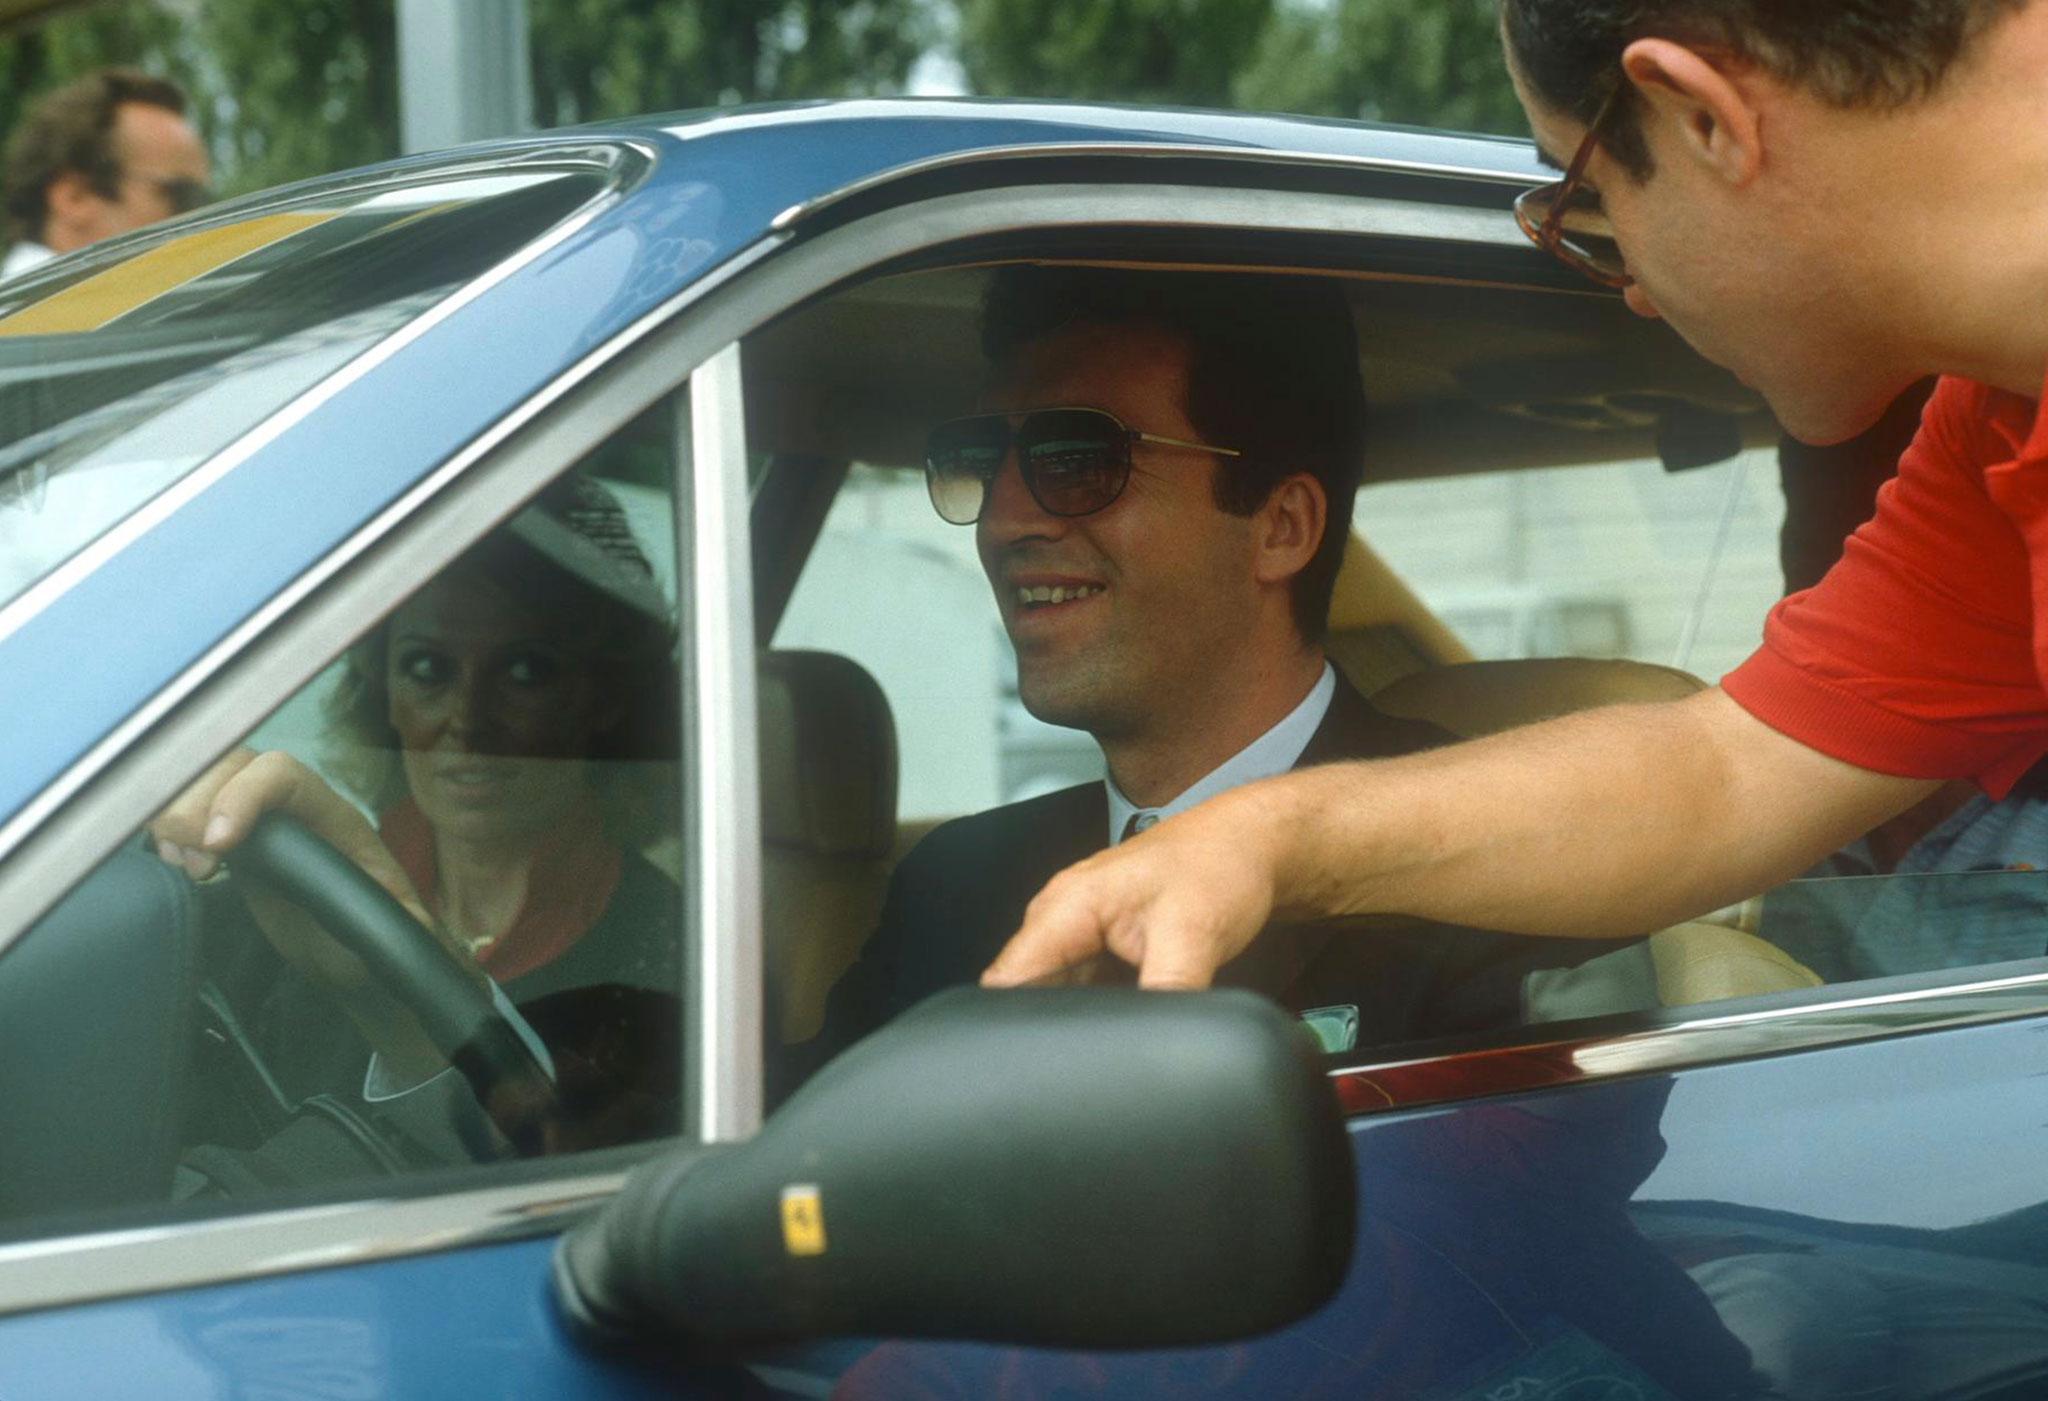 1983 Ferrari 400i GT 2+2 avec Piero Lardi Ferrari à son volant.